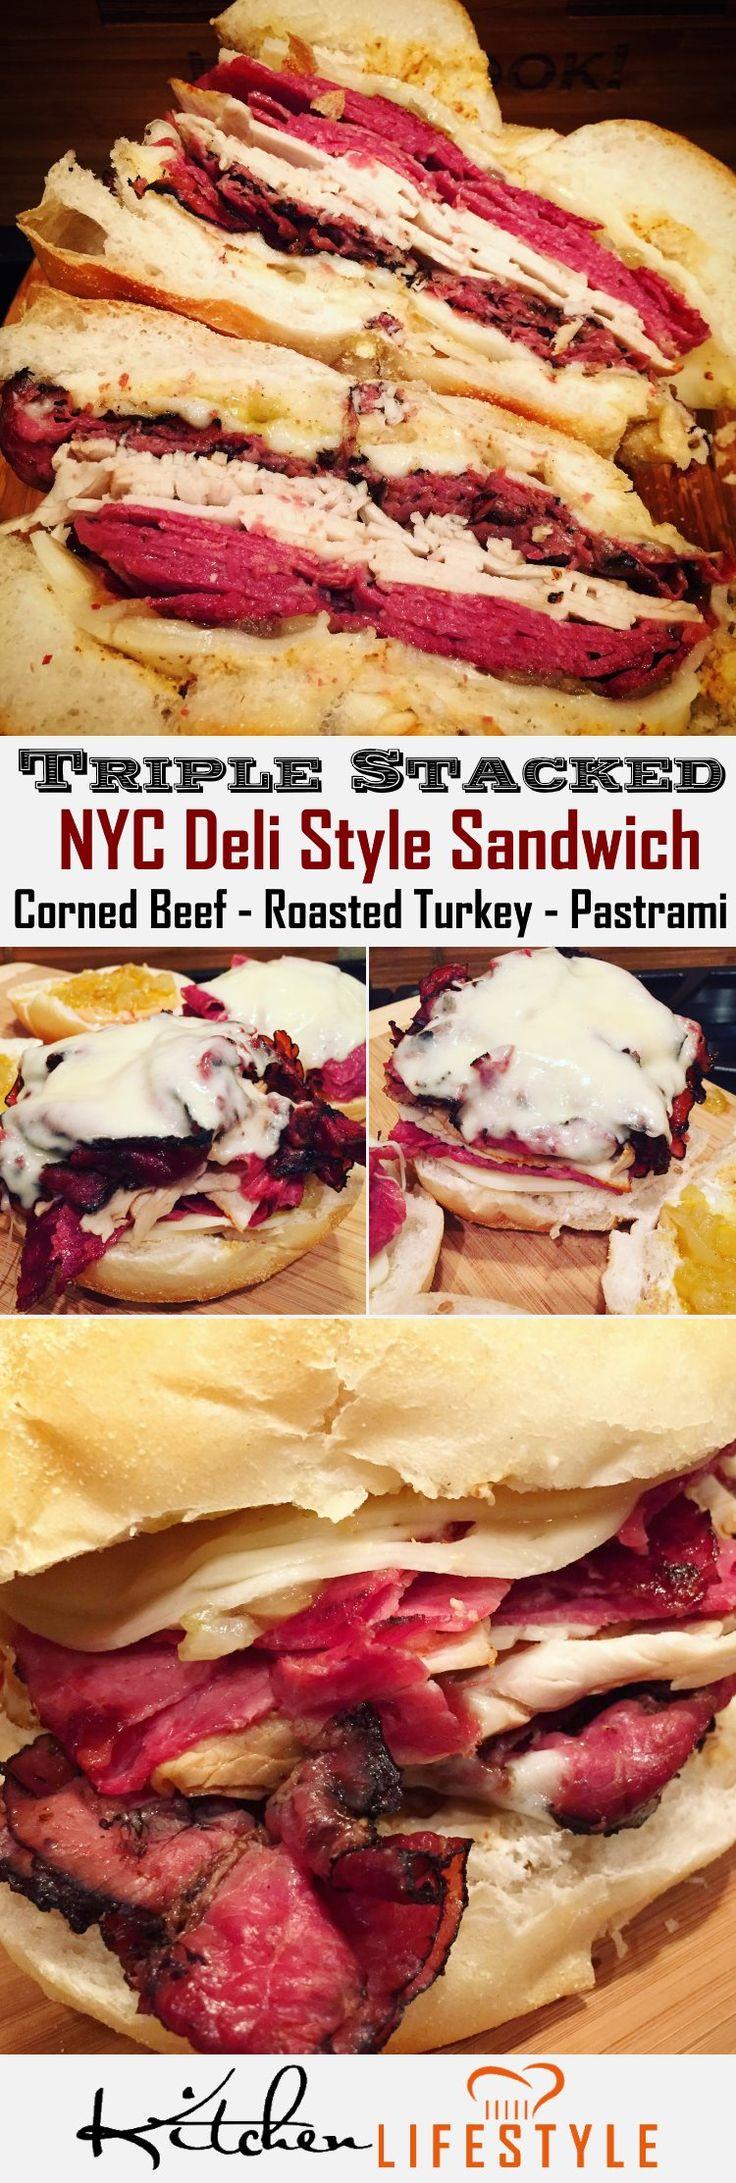 Triple Meat NYC Deli Sandwich Recipe: Turkey, Corned Beef, & Pastrami with Havarti & Swiss cheese, horseradish cream, & sweet onion jam. via @KitchnLifestyle